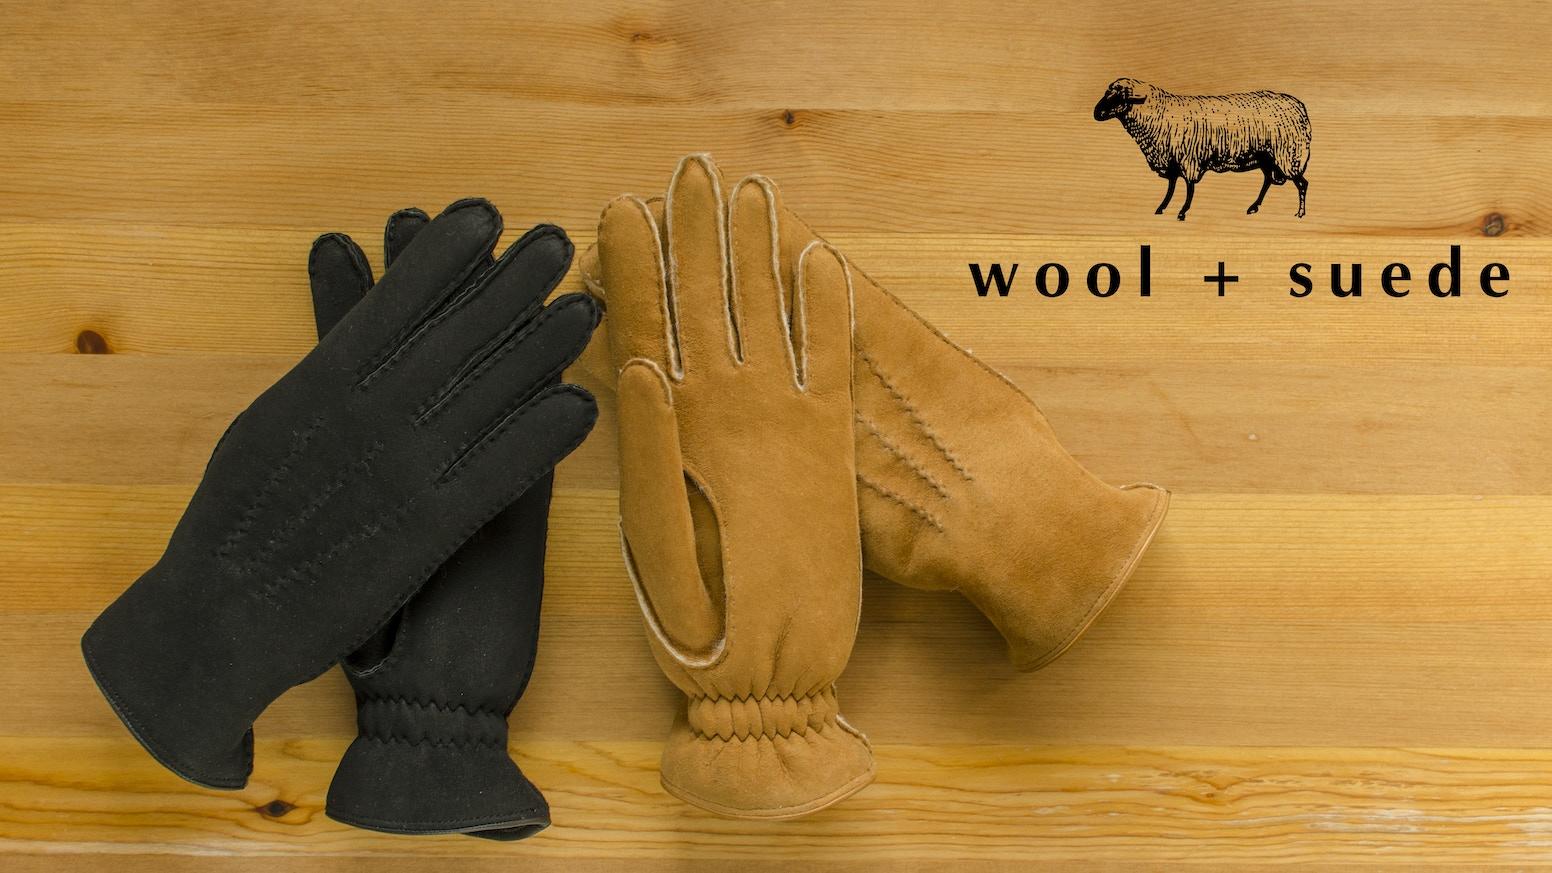 wool + suede | redefining warm and stylishwinter glovesfor the modern man